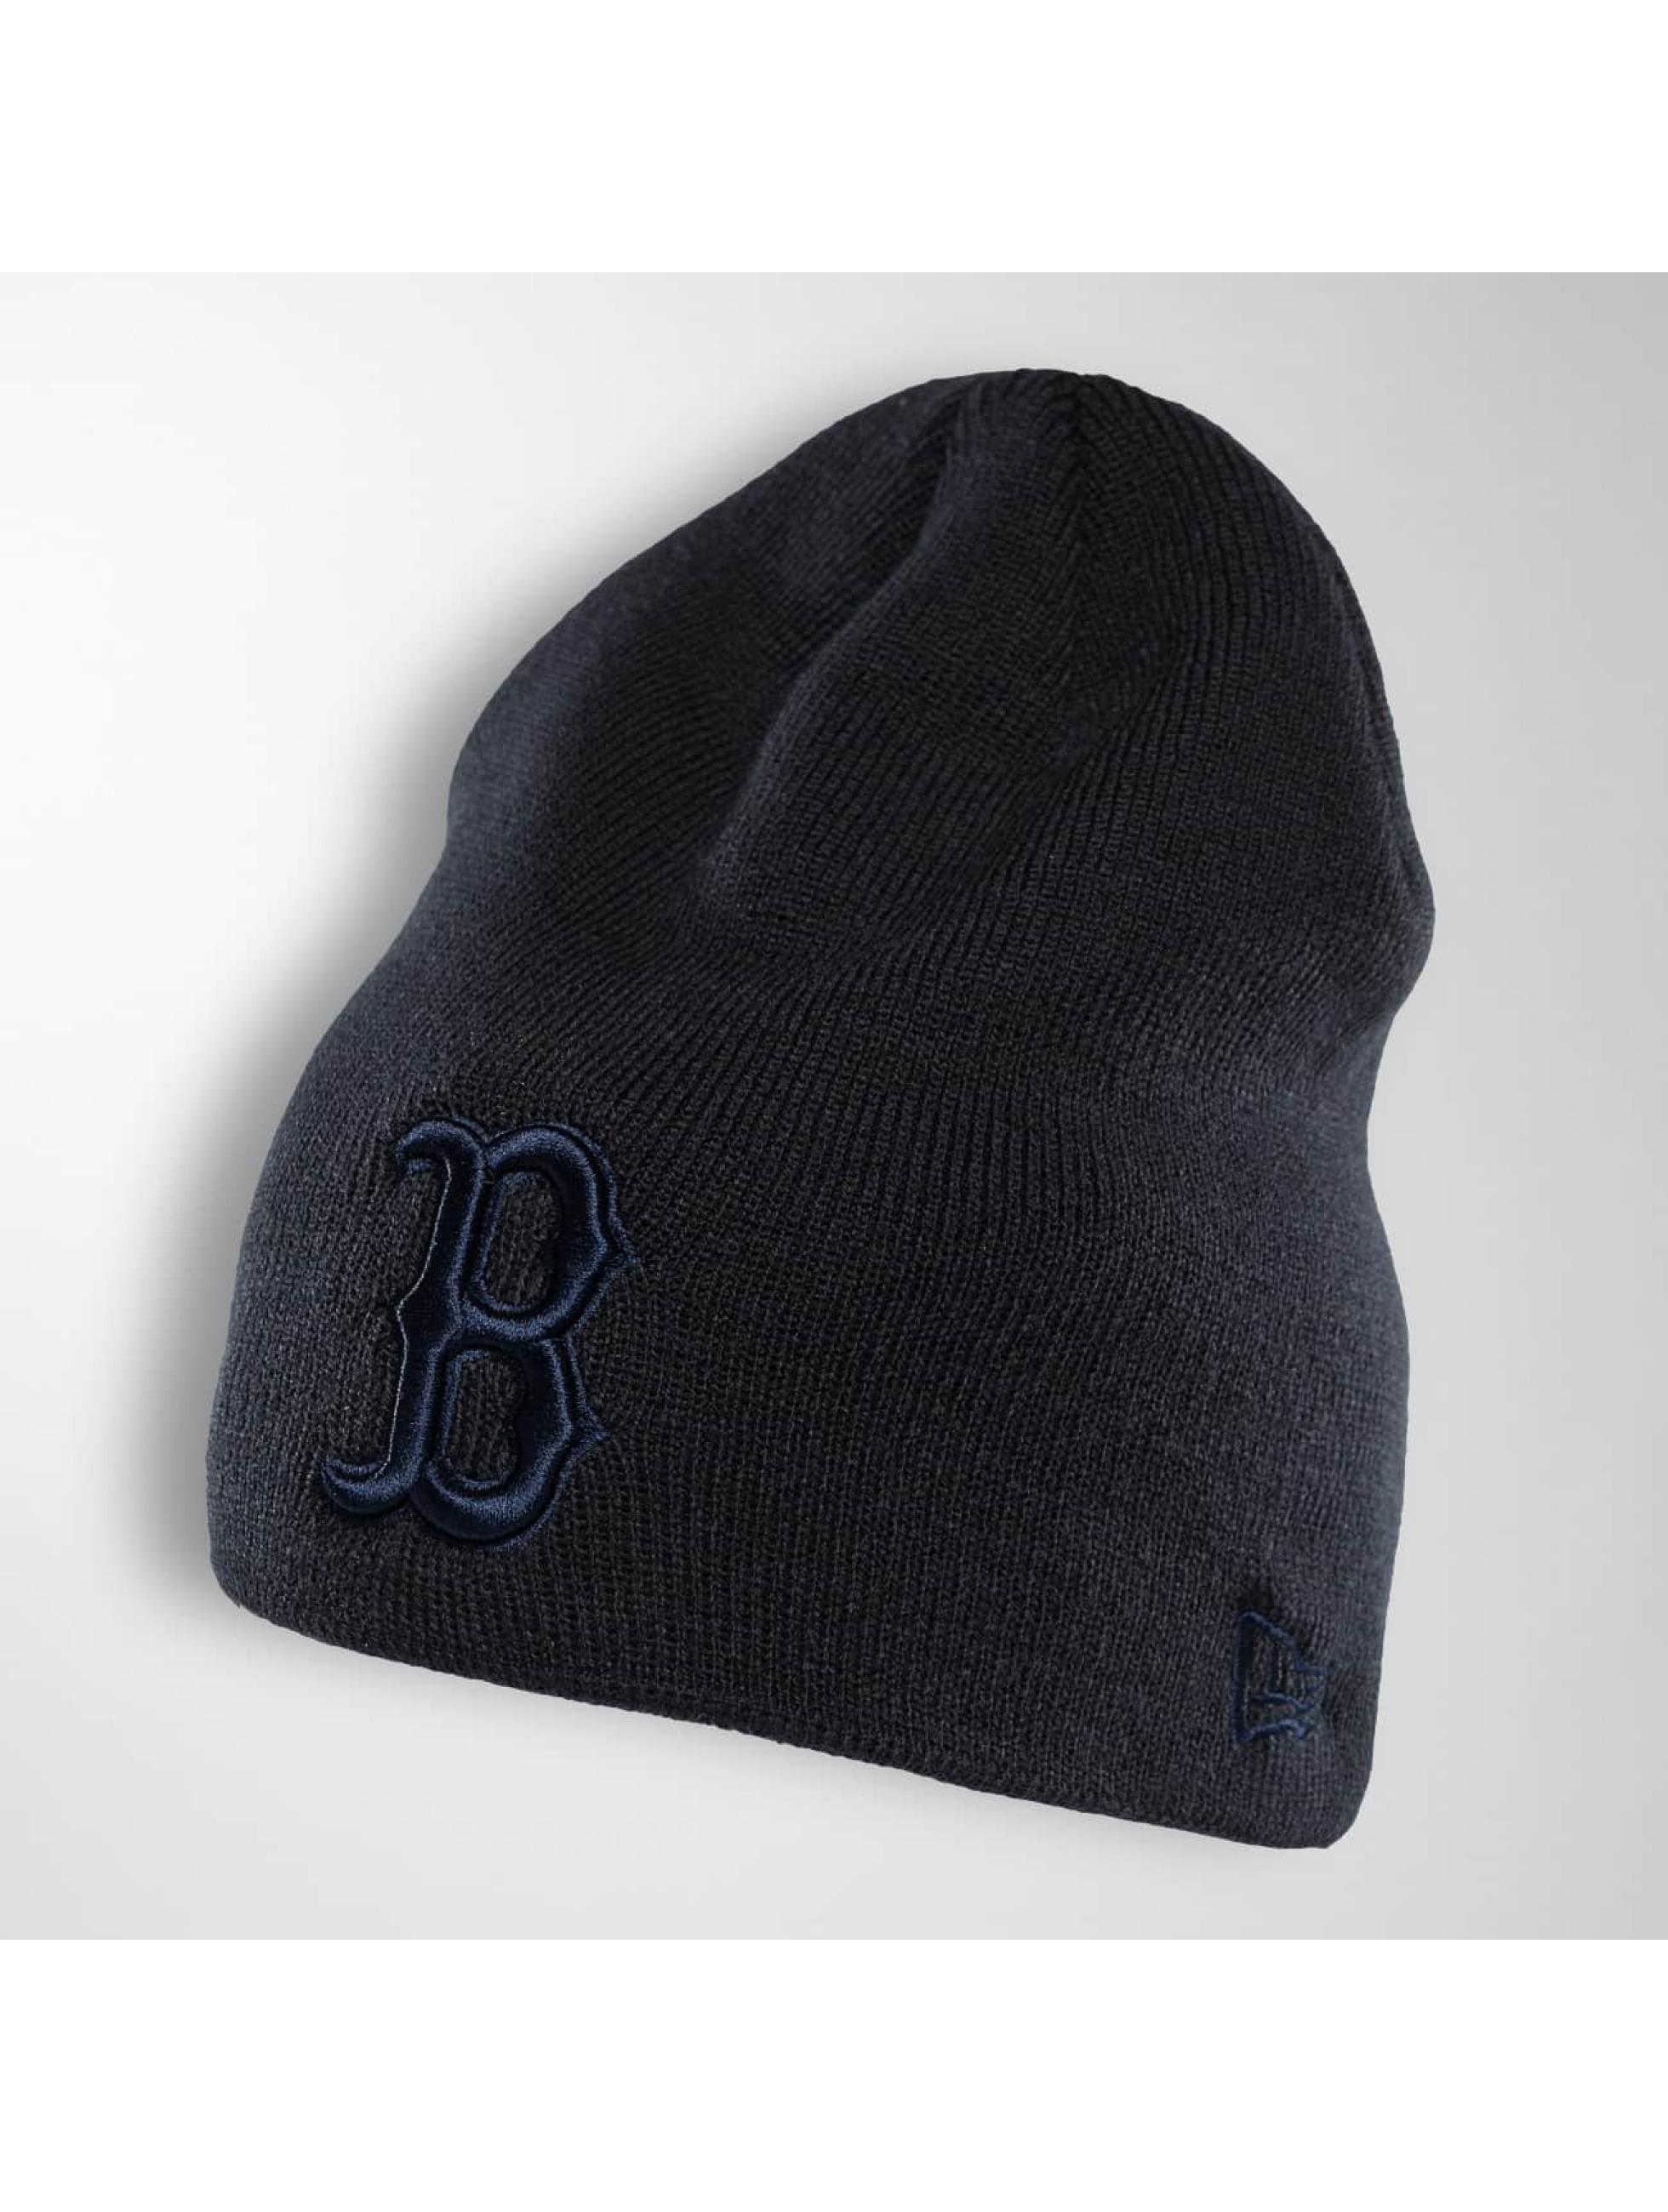 New Era Hat-1 Seasonal Skull Boston Red Sox blue